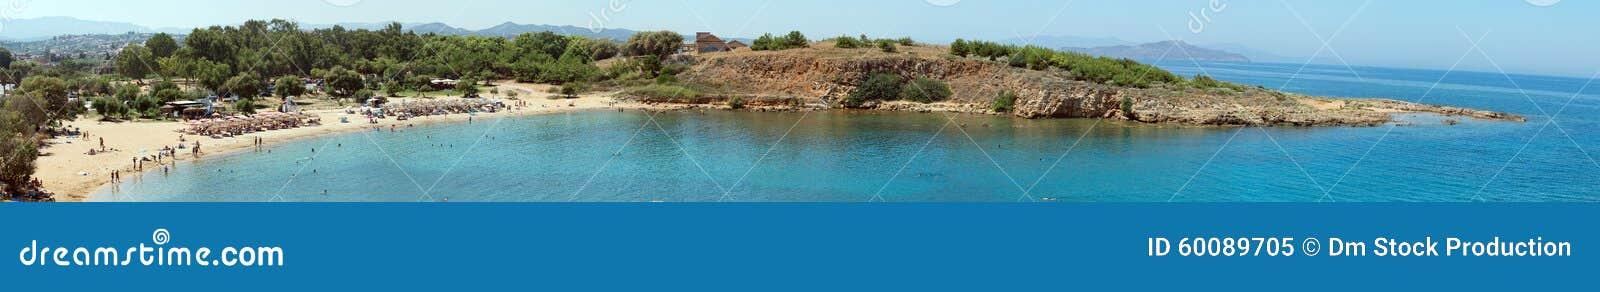 Panorama Of The Beach. Stock Photo - Image: 60089705